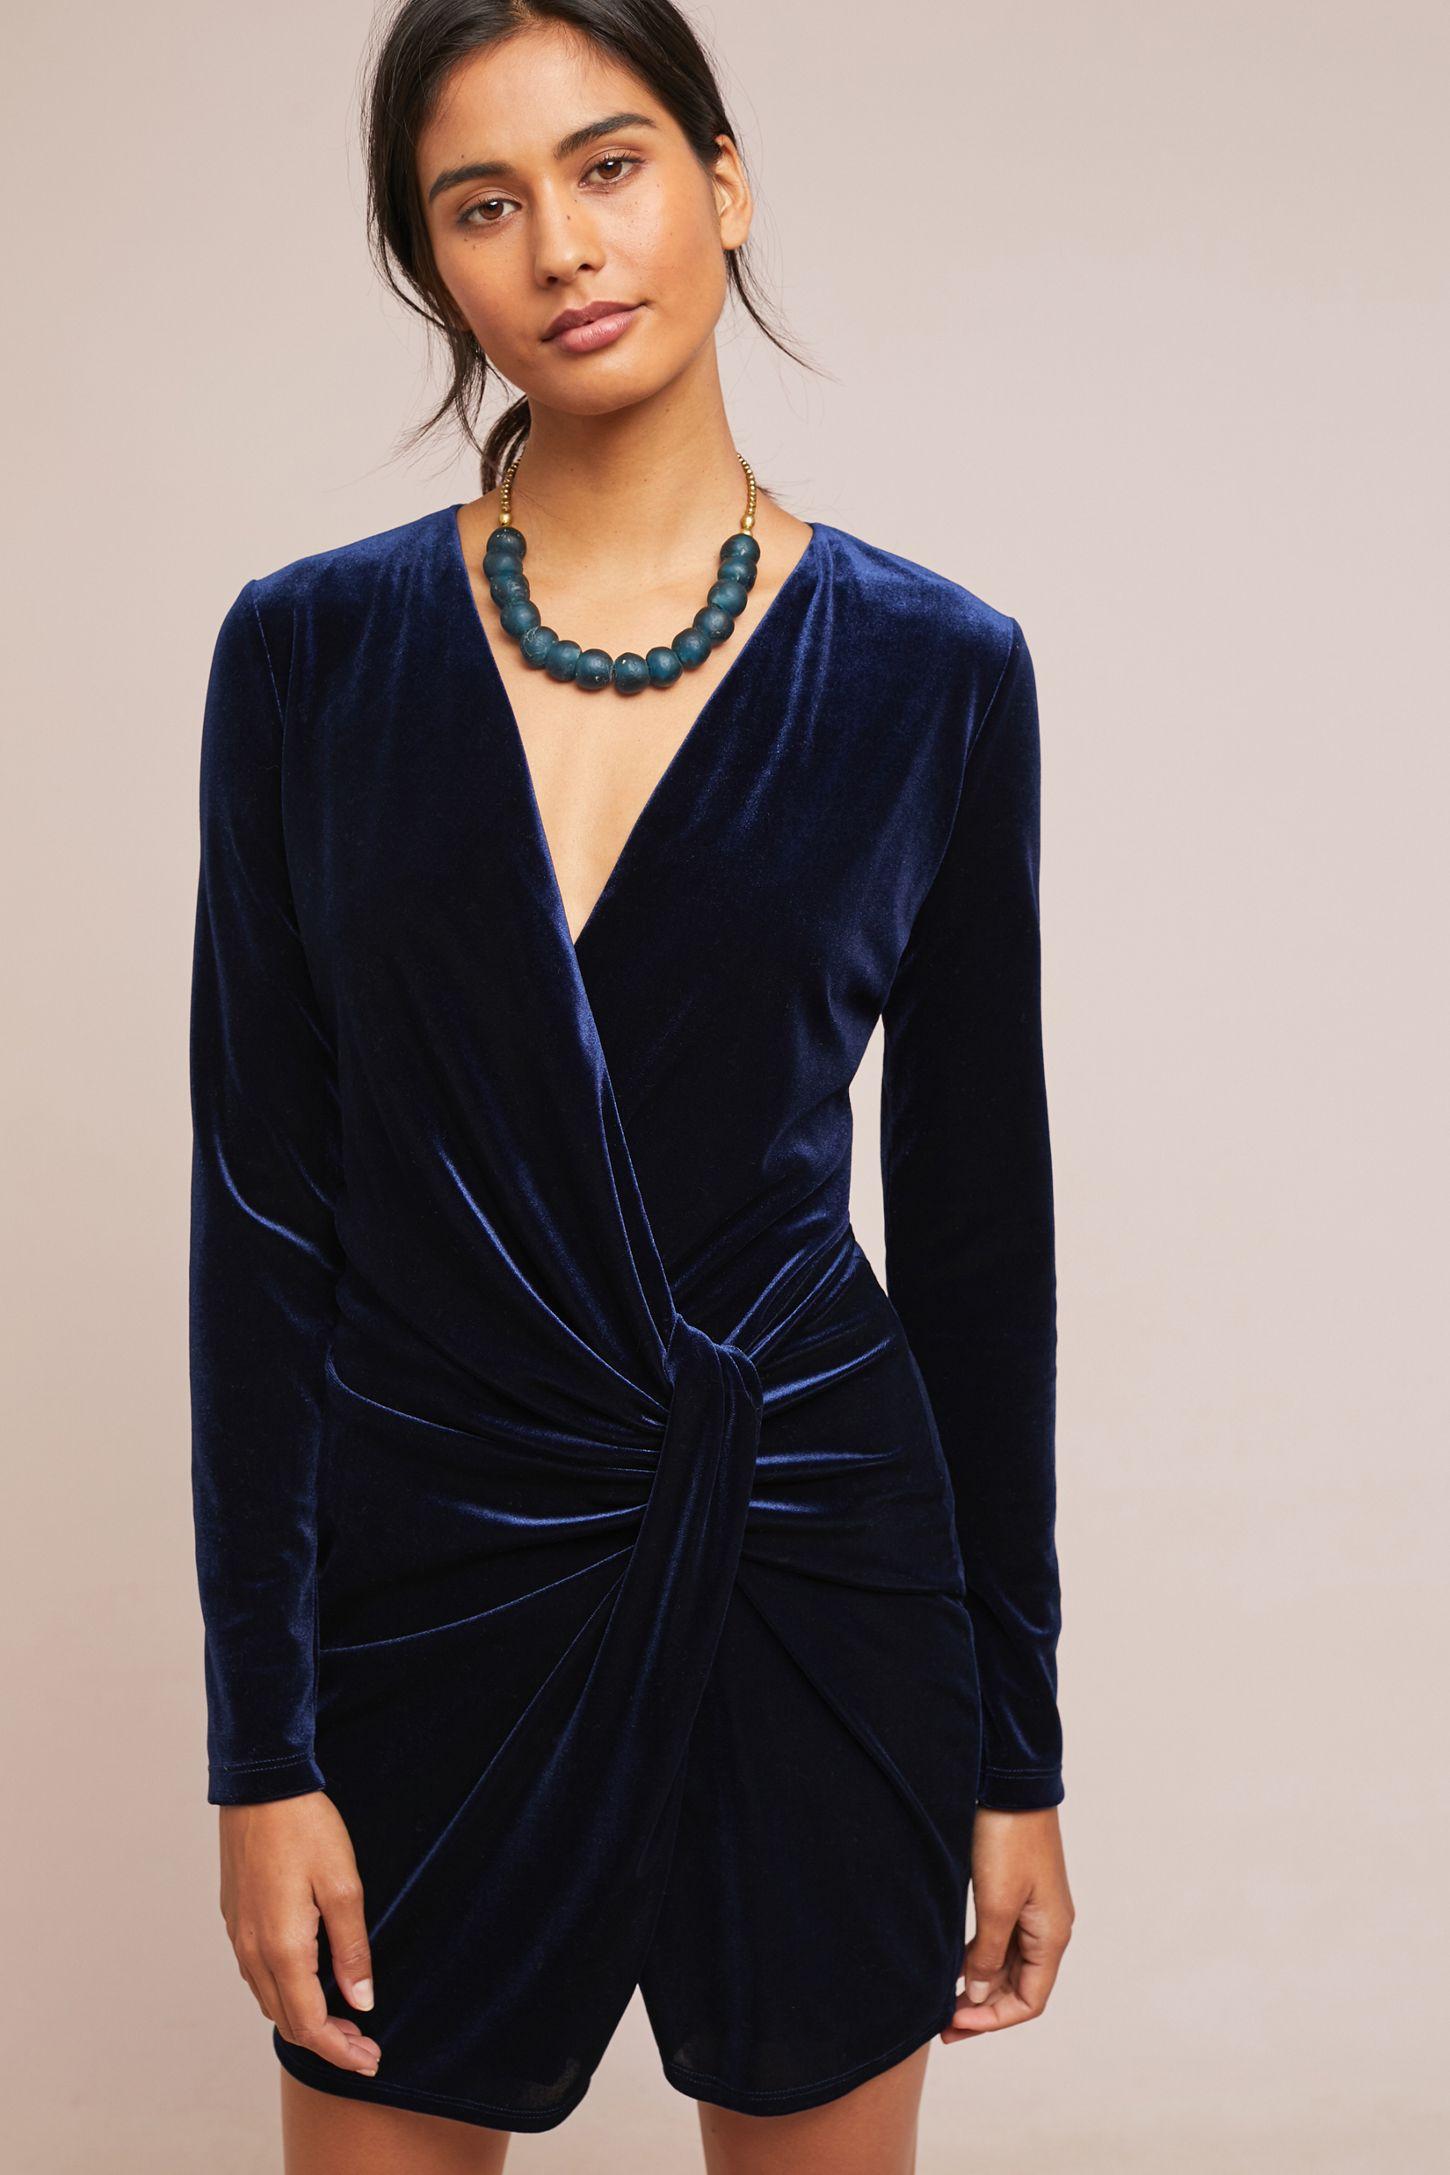 fb2adf510b5 Knotted Velvet Dress